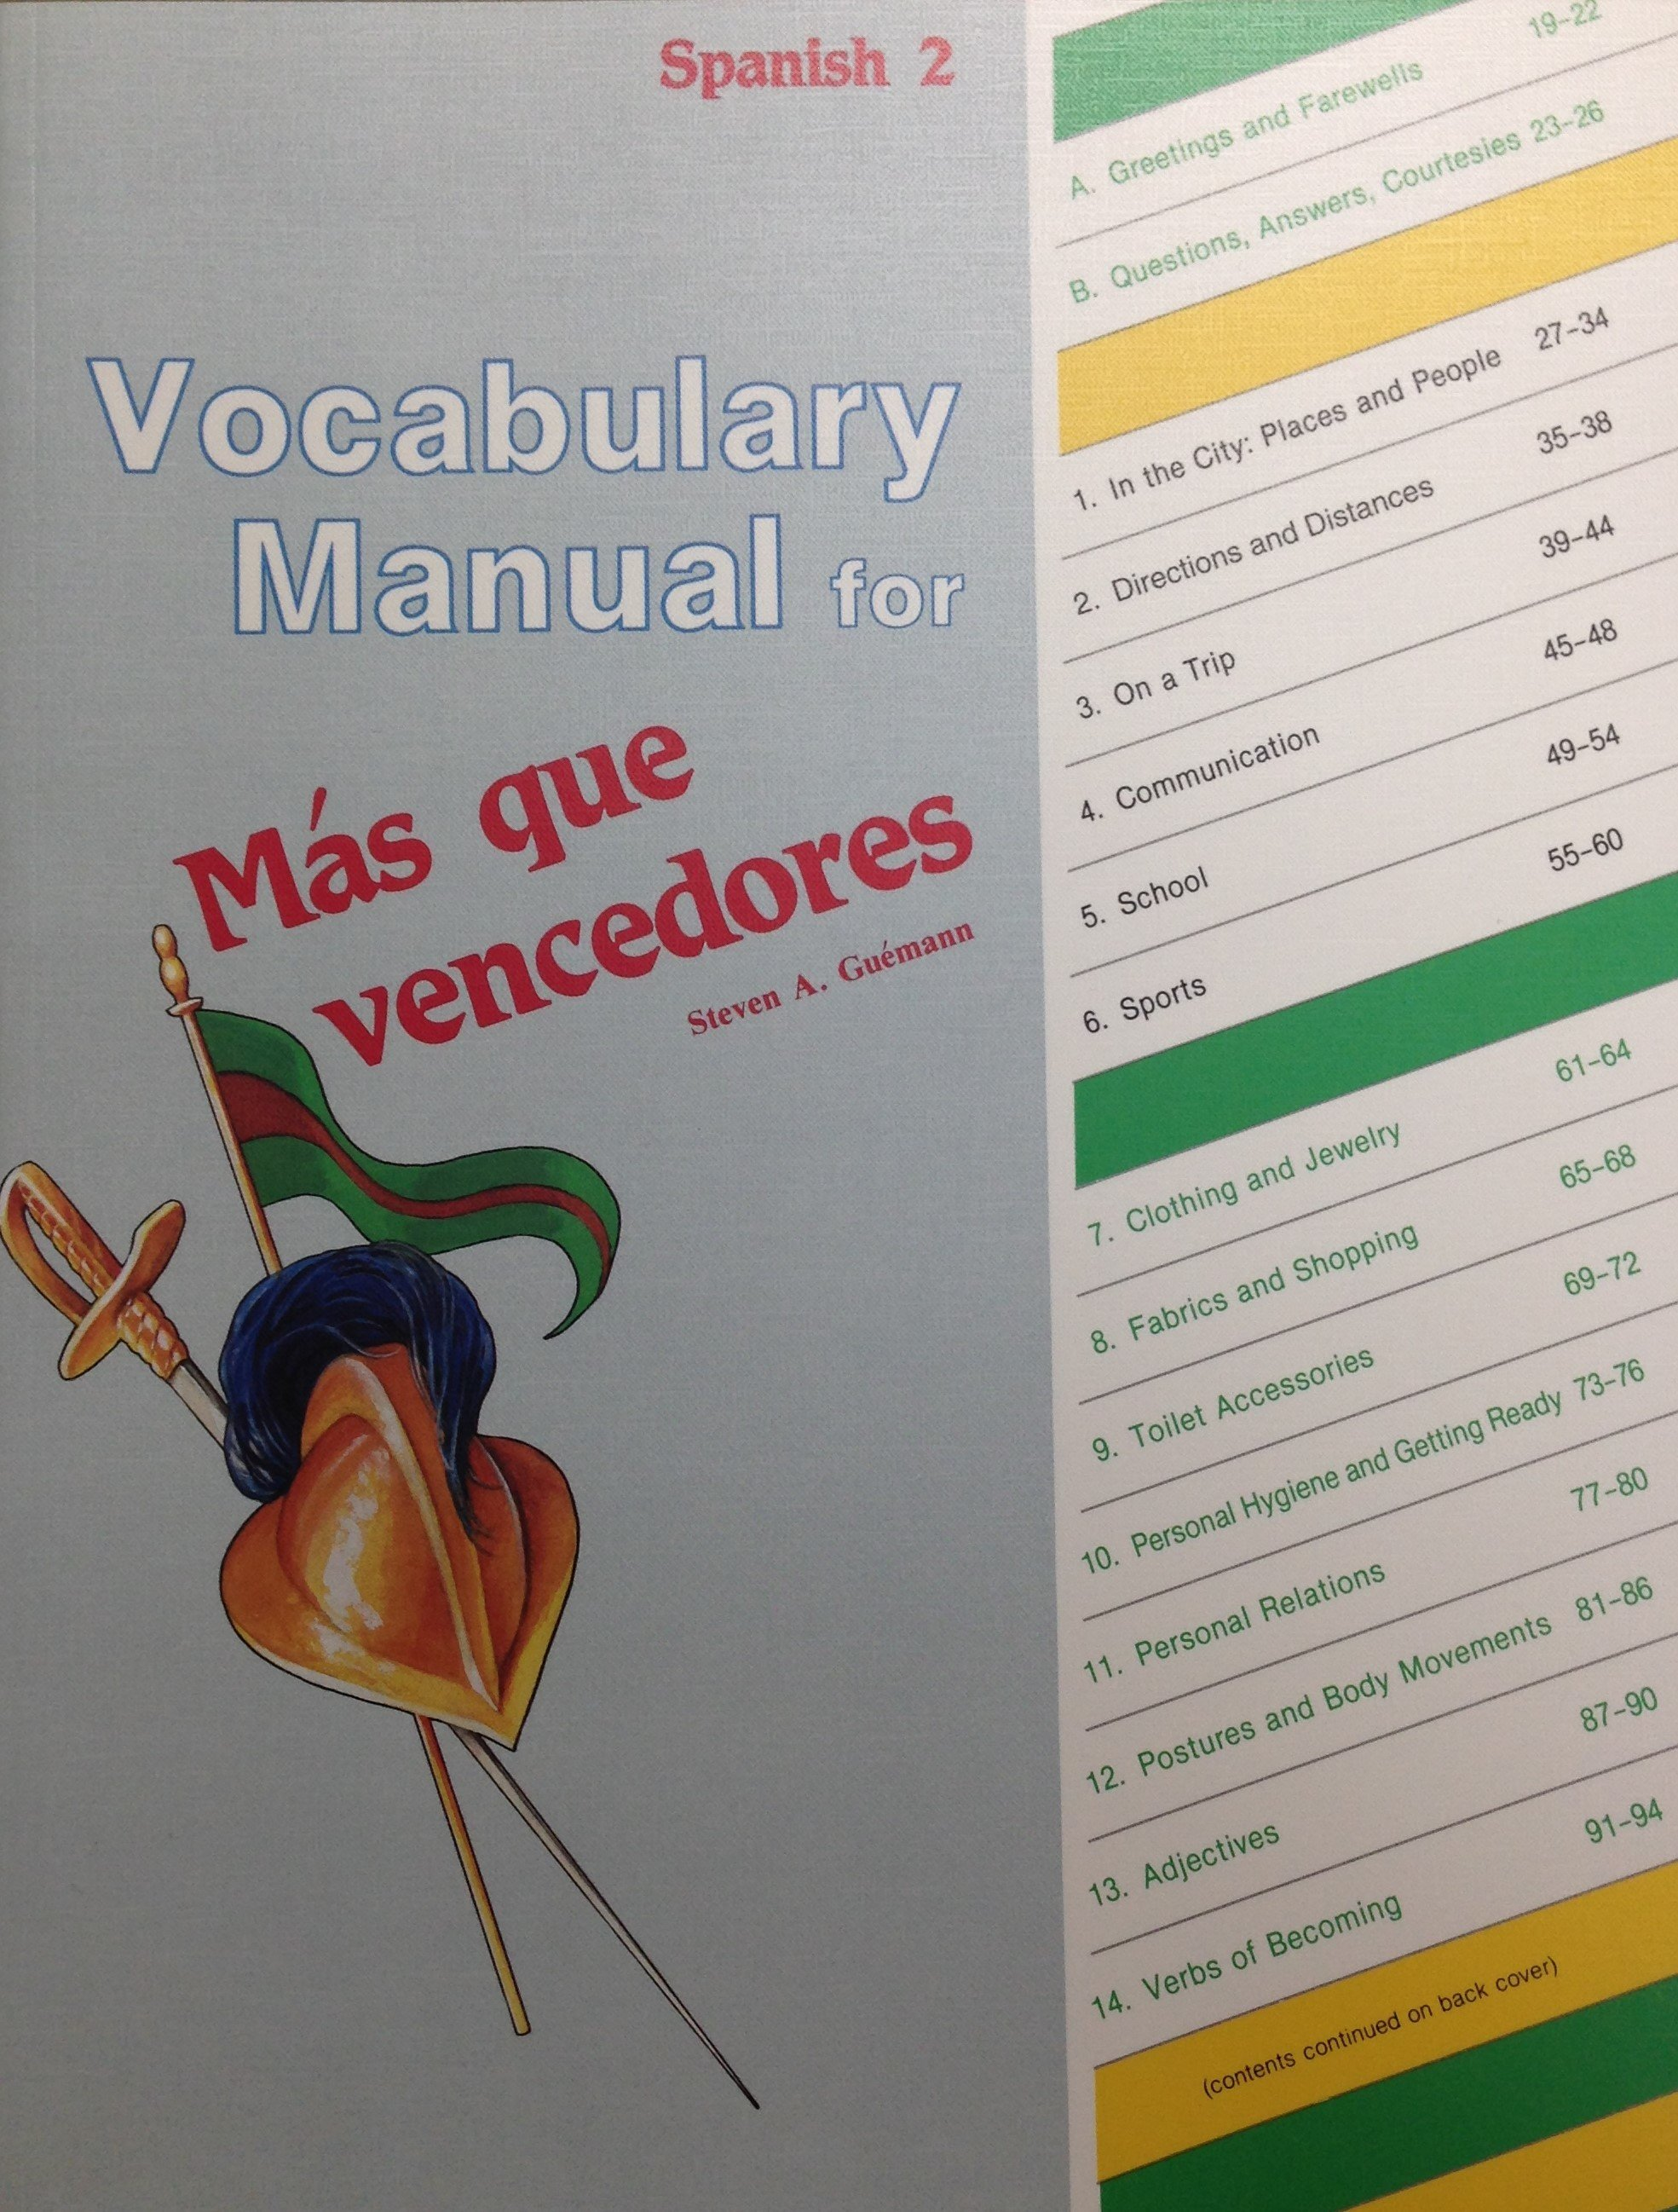 Vocabulary Manual